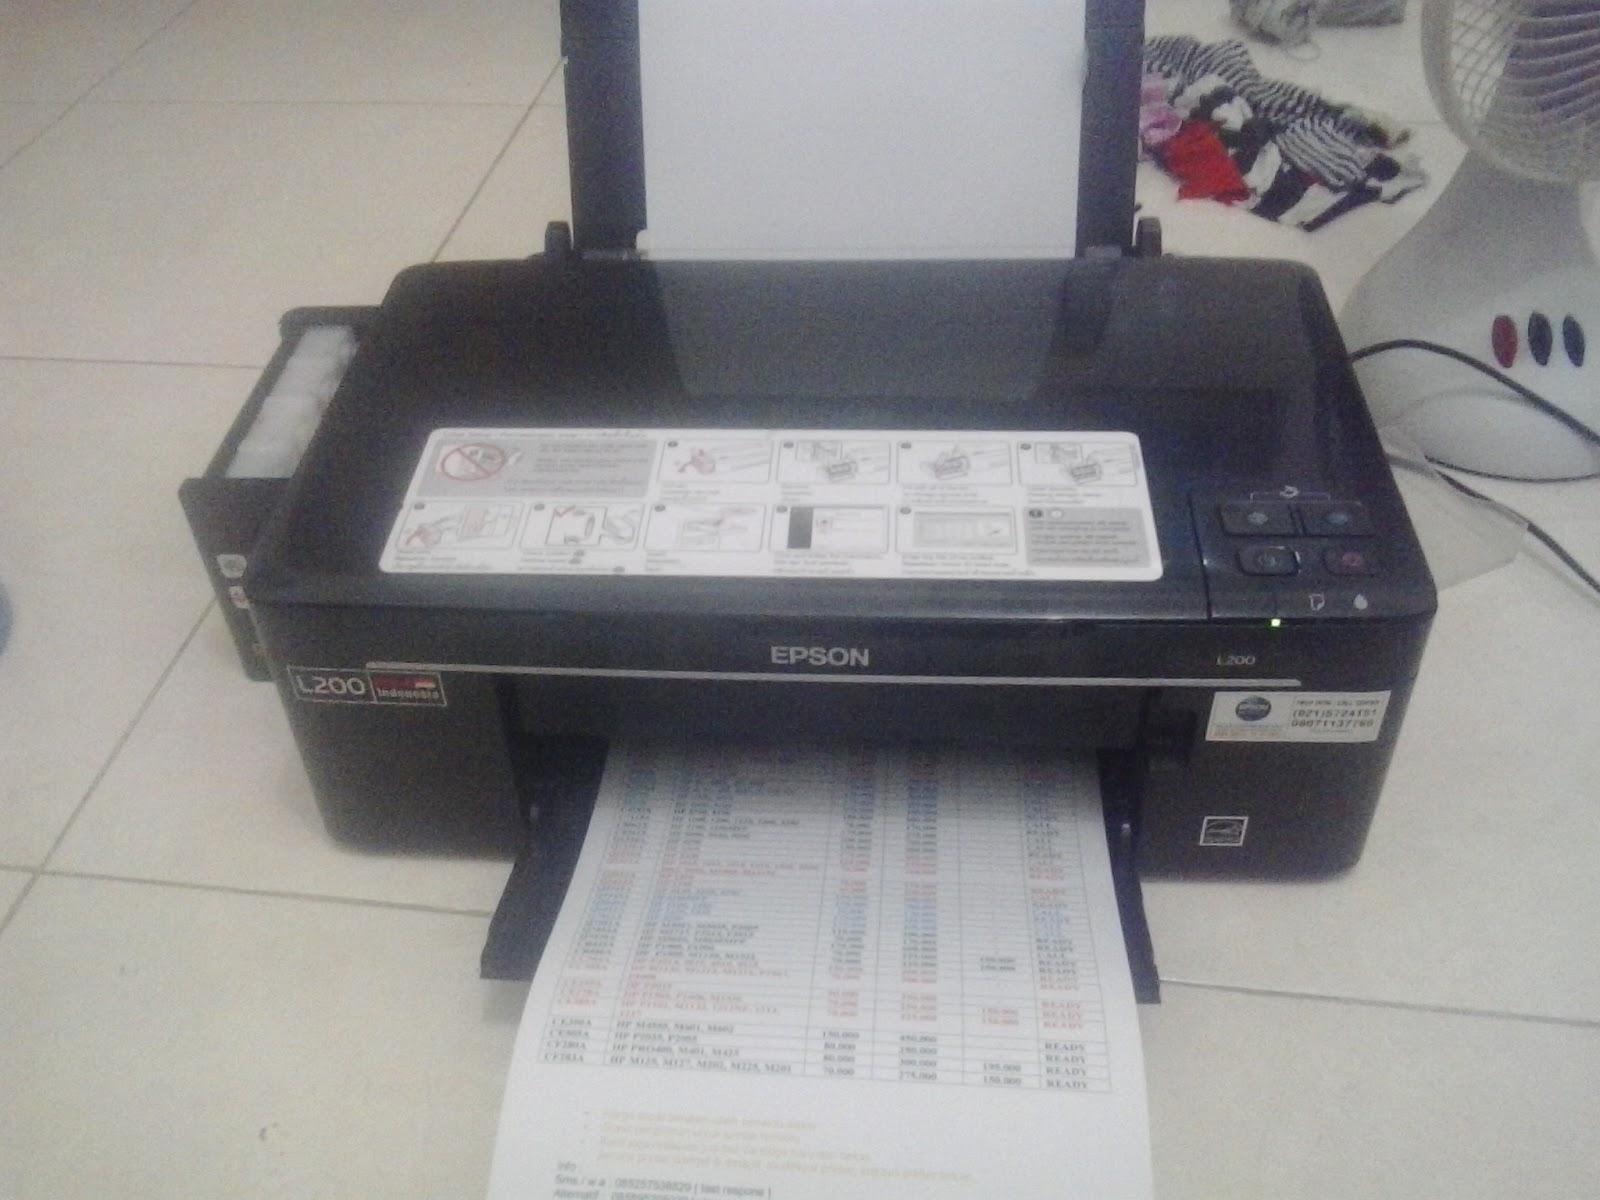 Jual Epson L200 Bekas Mulus Specialist Refill Toner